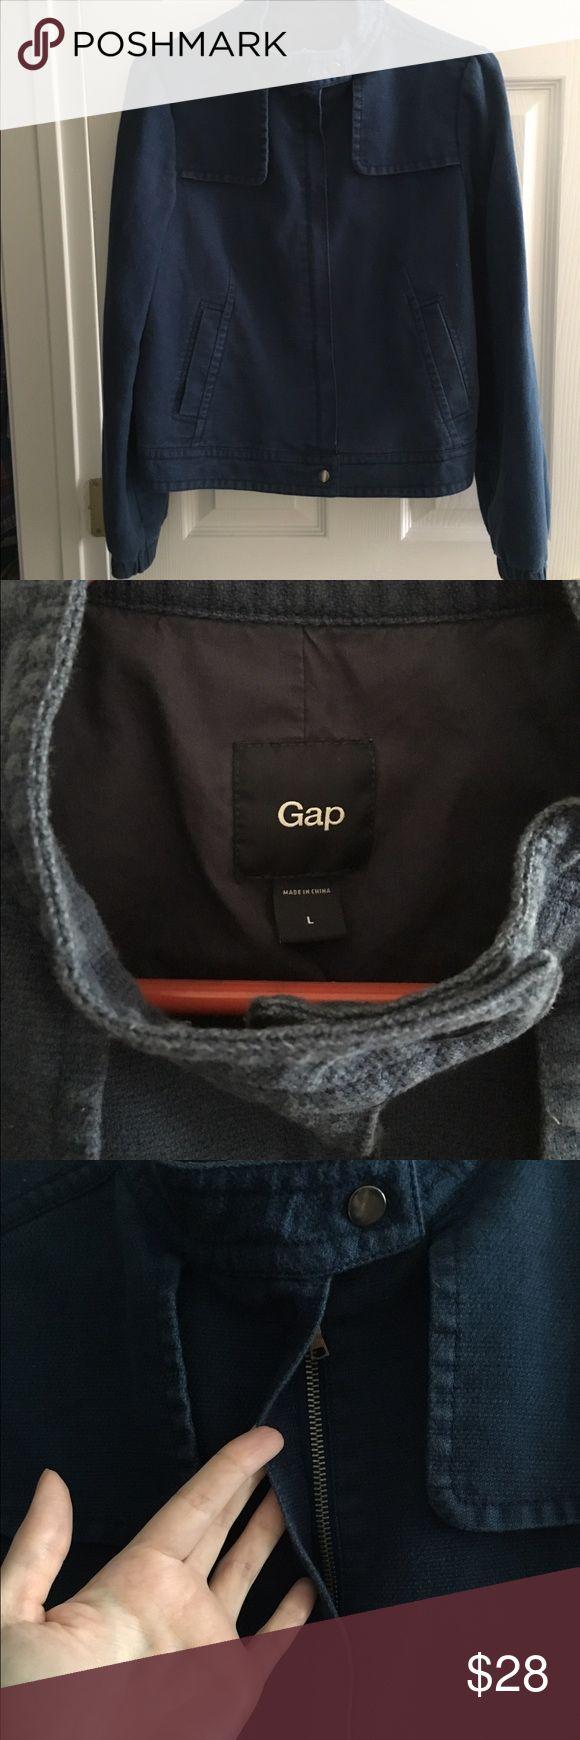 Gap Jacket Size L Gap Jacket. Blue, Size Large. In good used condition. GAP Jackets & Coats